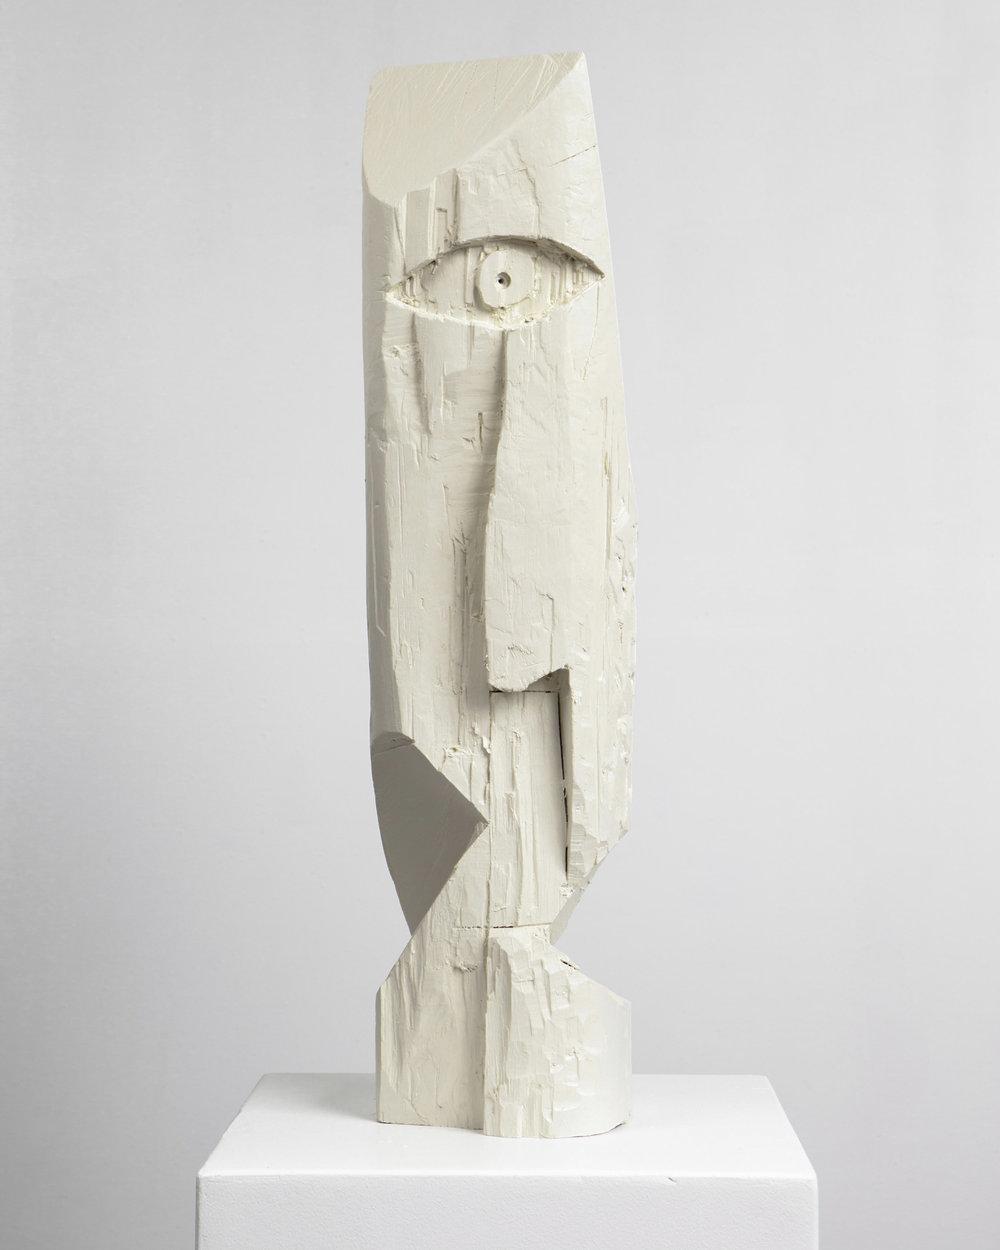 Sculpture 1, 2017